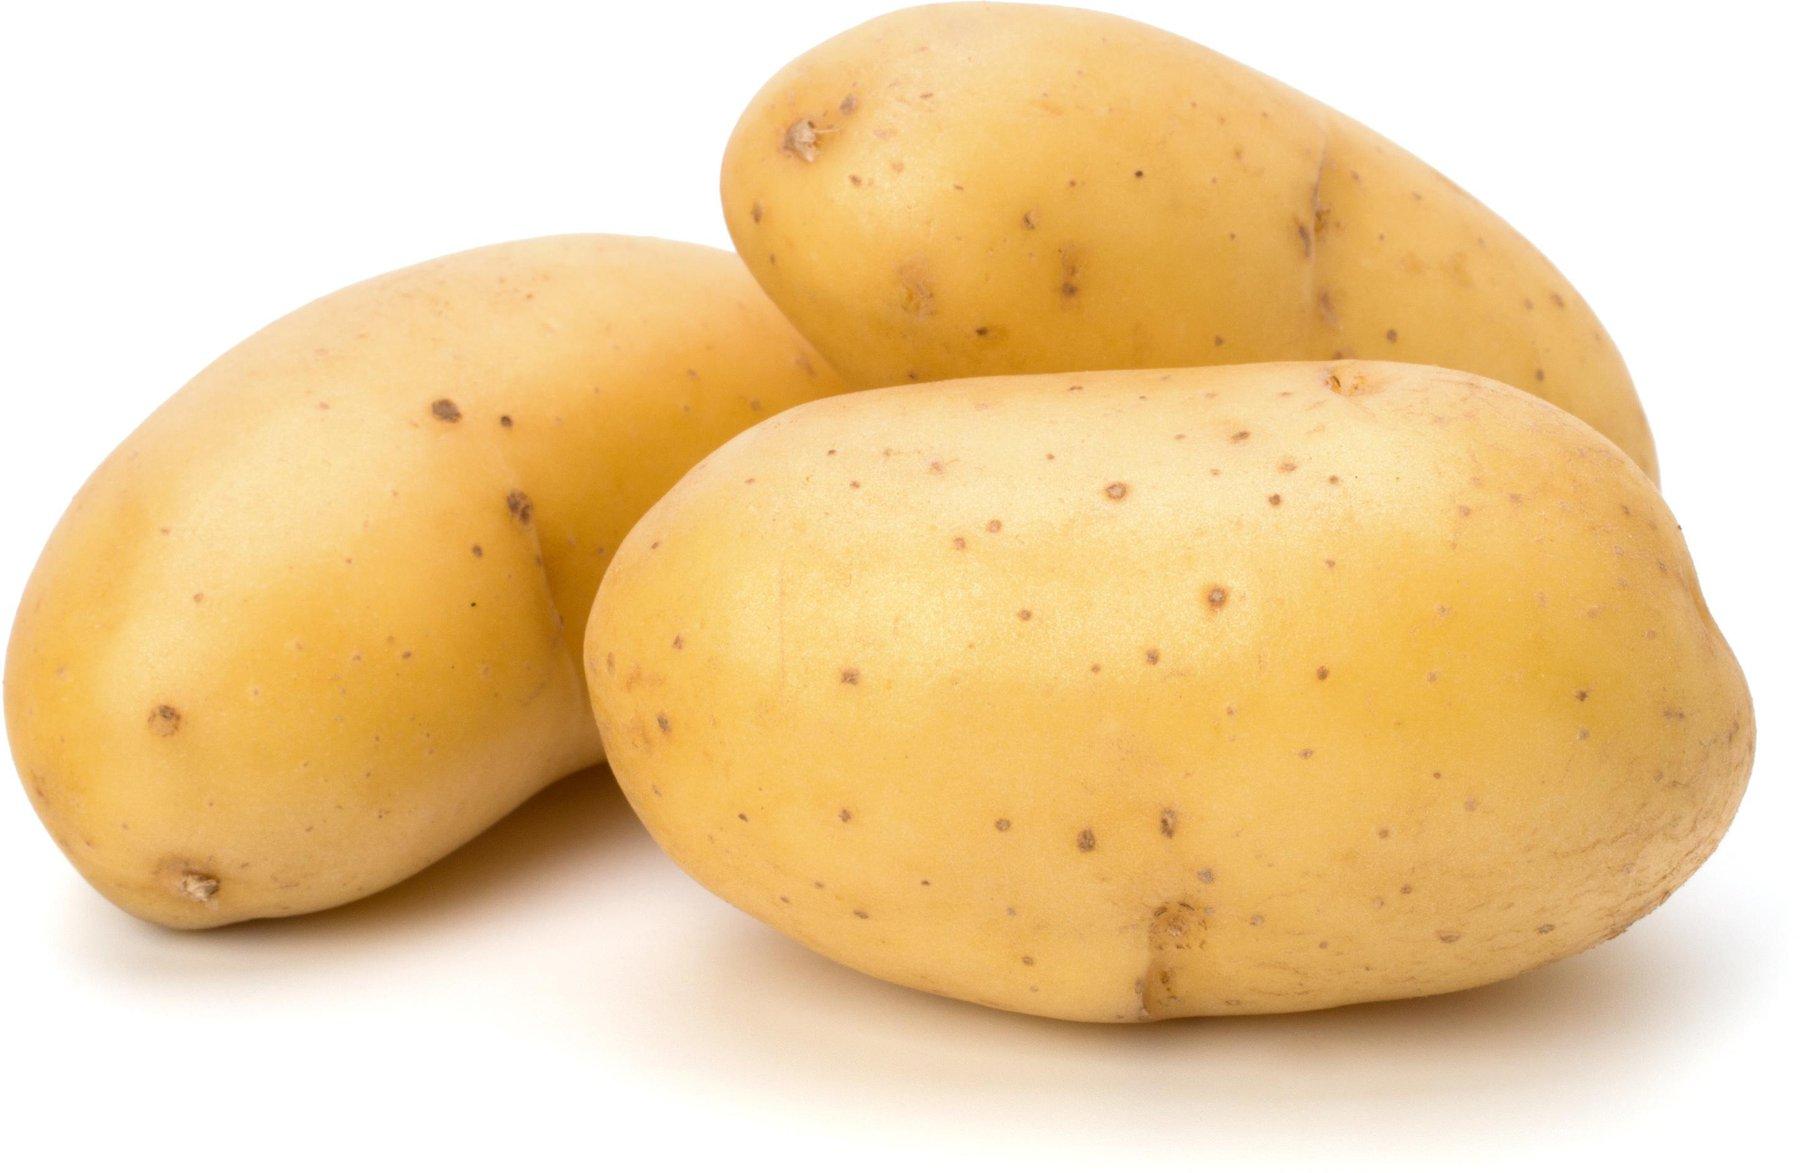 PFLANZKARTOFFEL SIEGLINDE 5 kg Pflanzkartoffeln zertifiziert Saatkartoffel früh